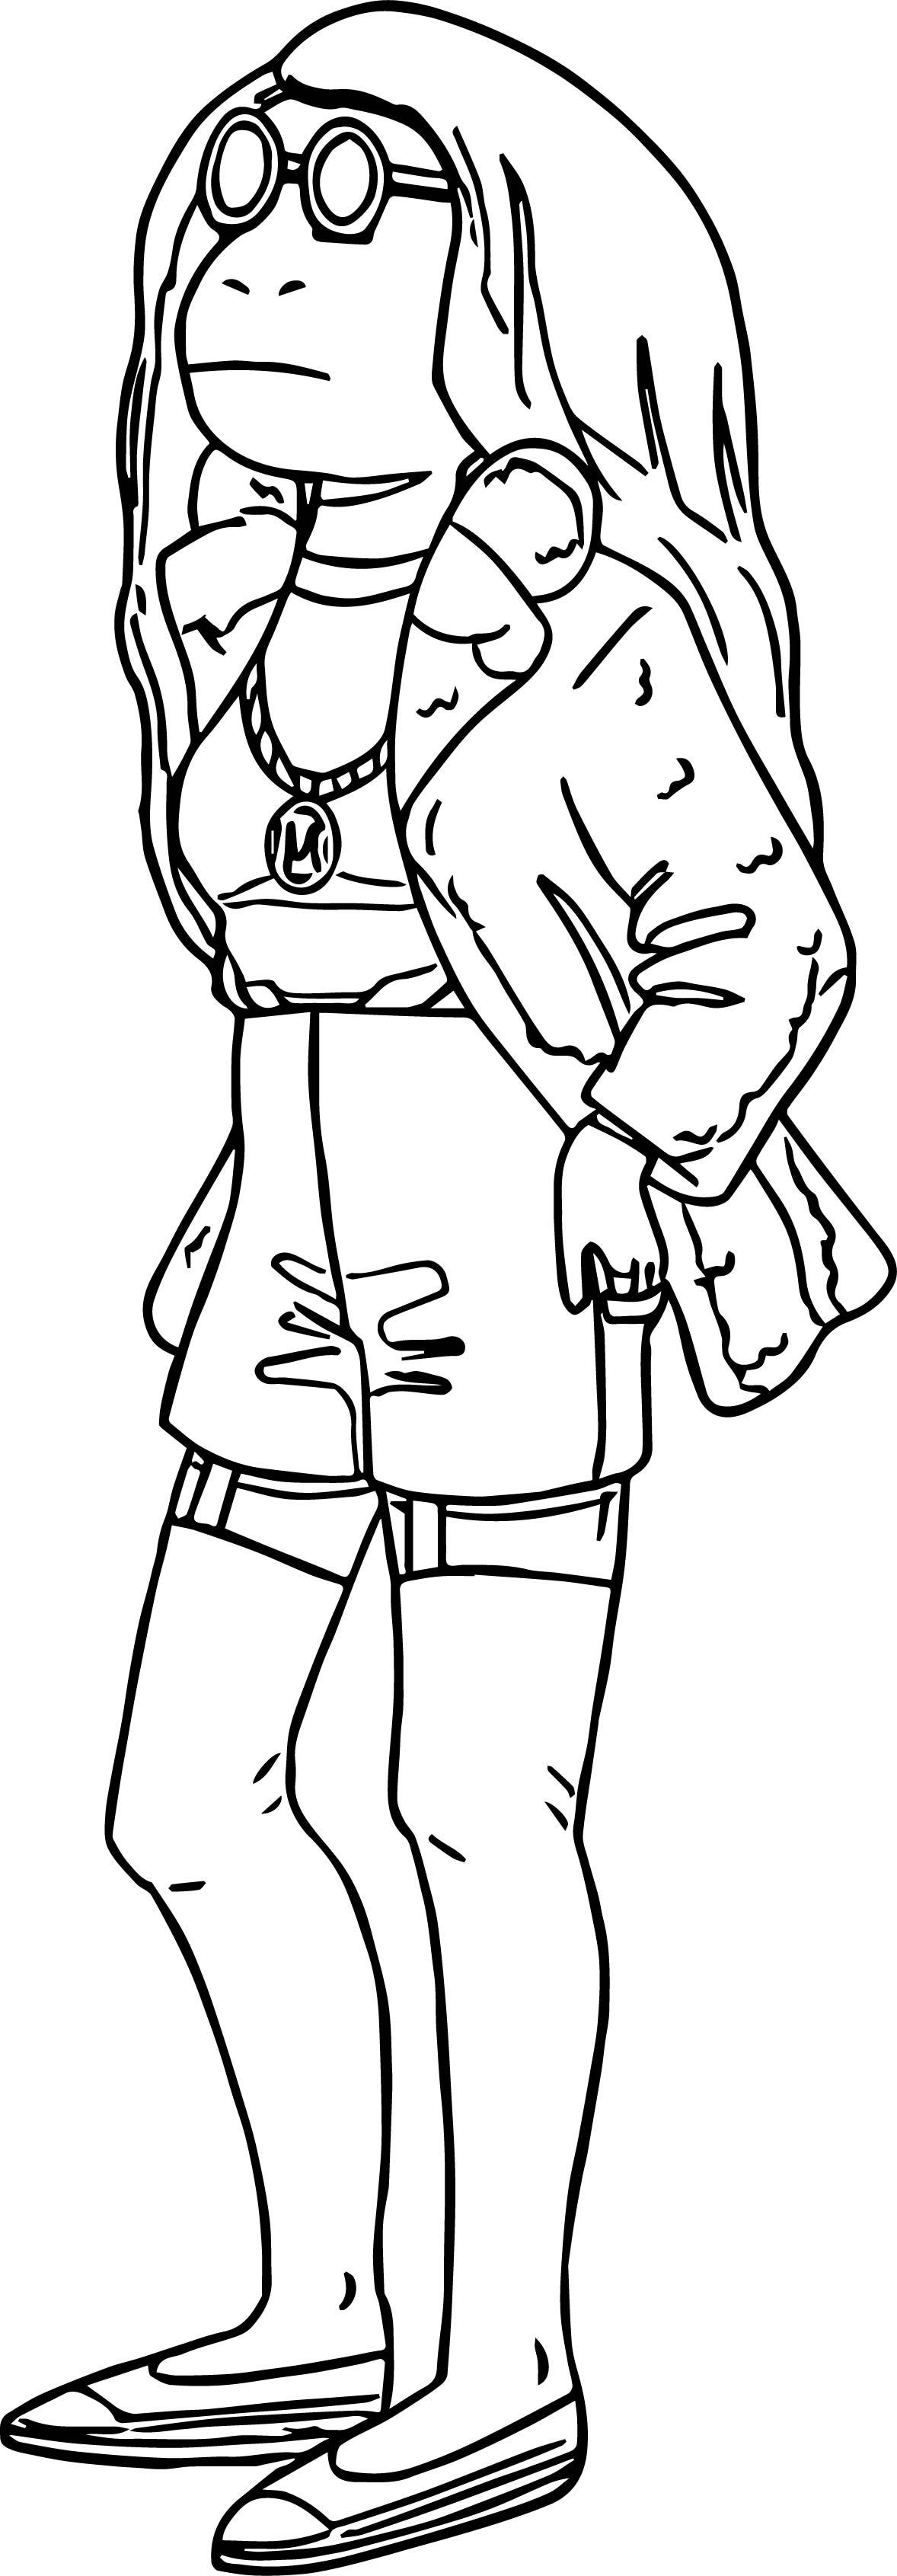 Big Arthur Girlfriend Coloring Page